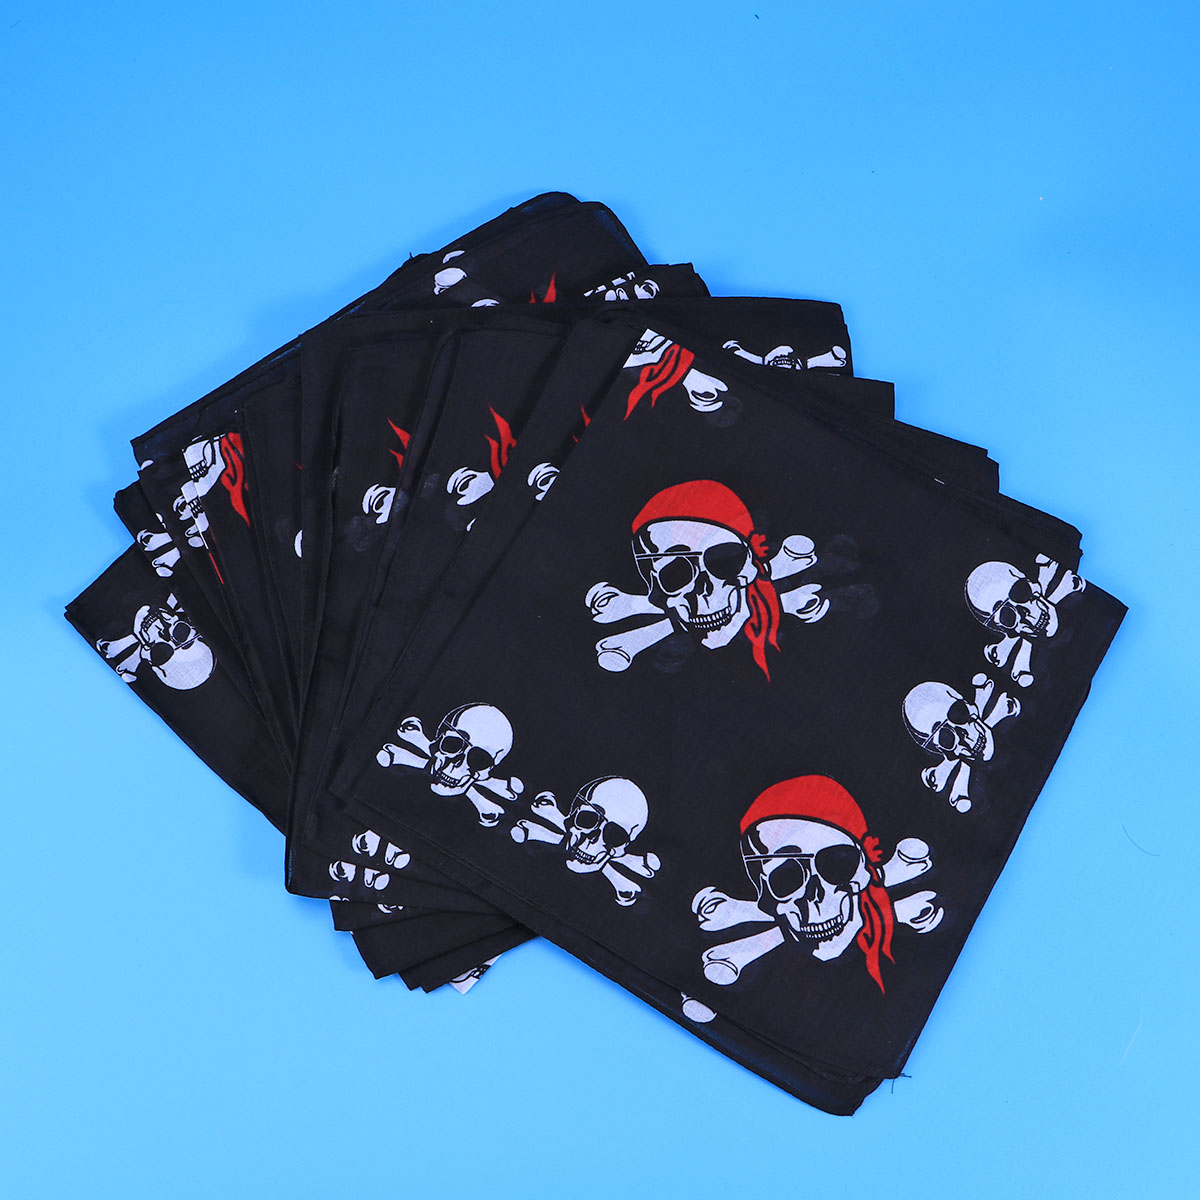 Grey Accessories For Boys Skull Print Hanky Boys Accessories Skull Hanky